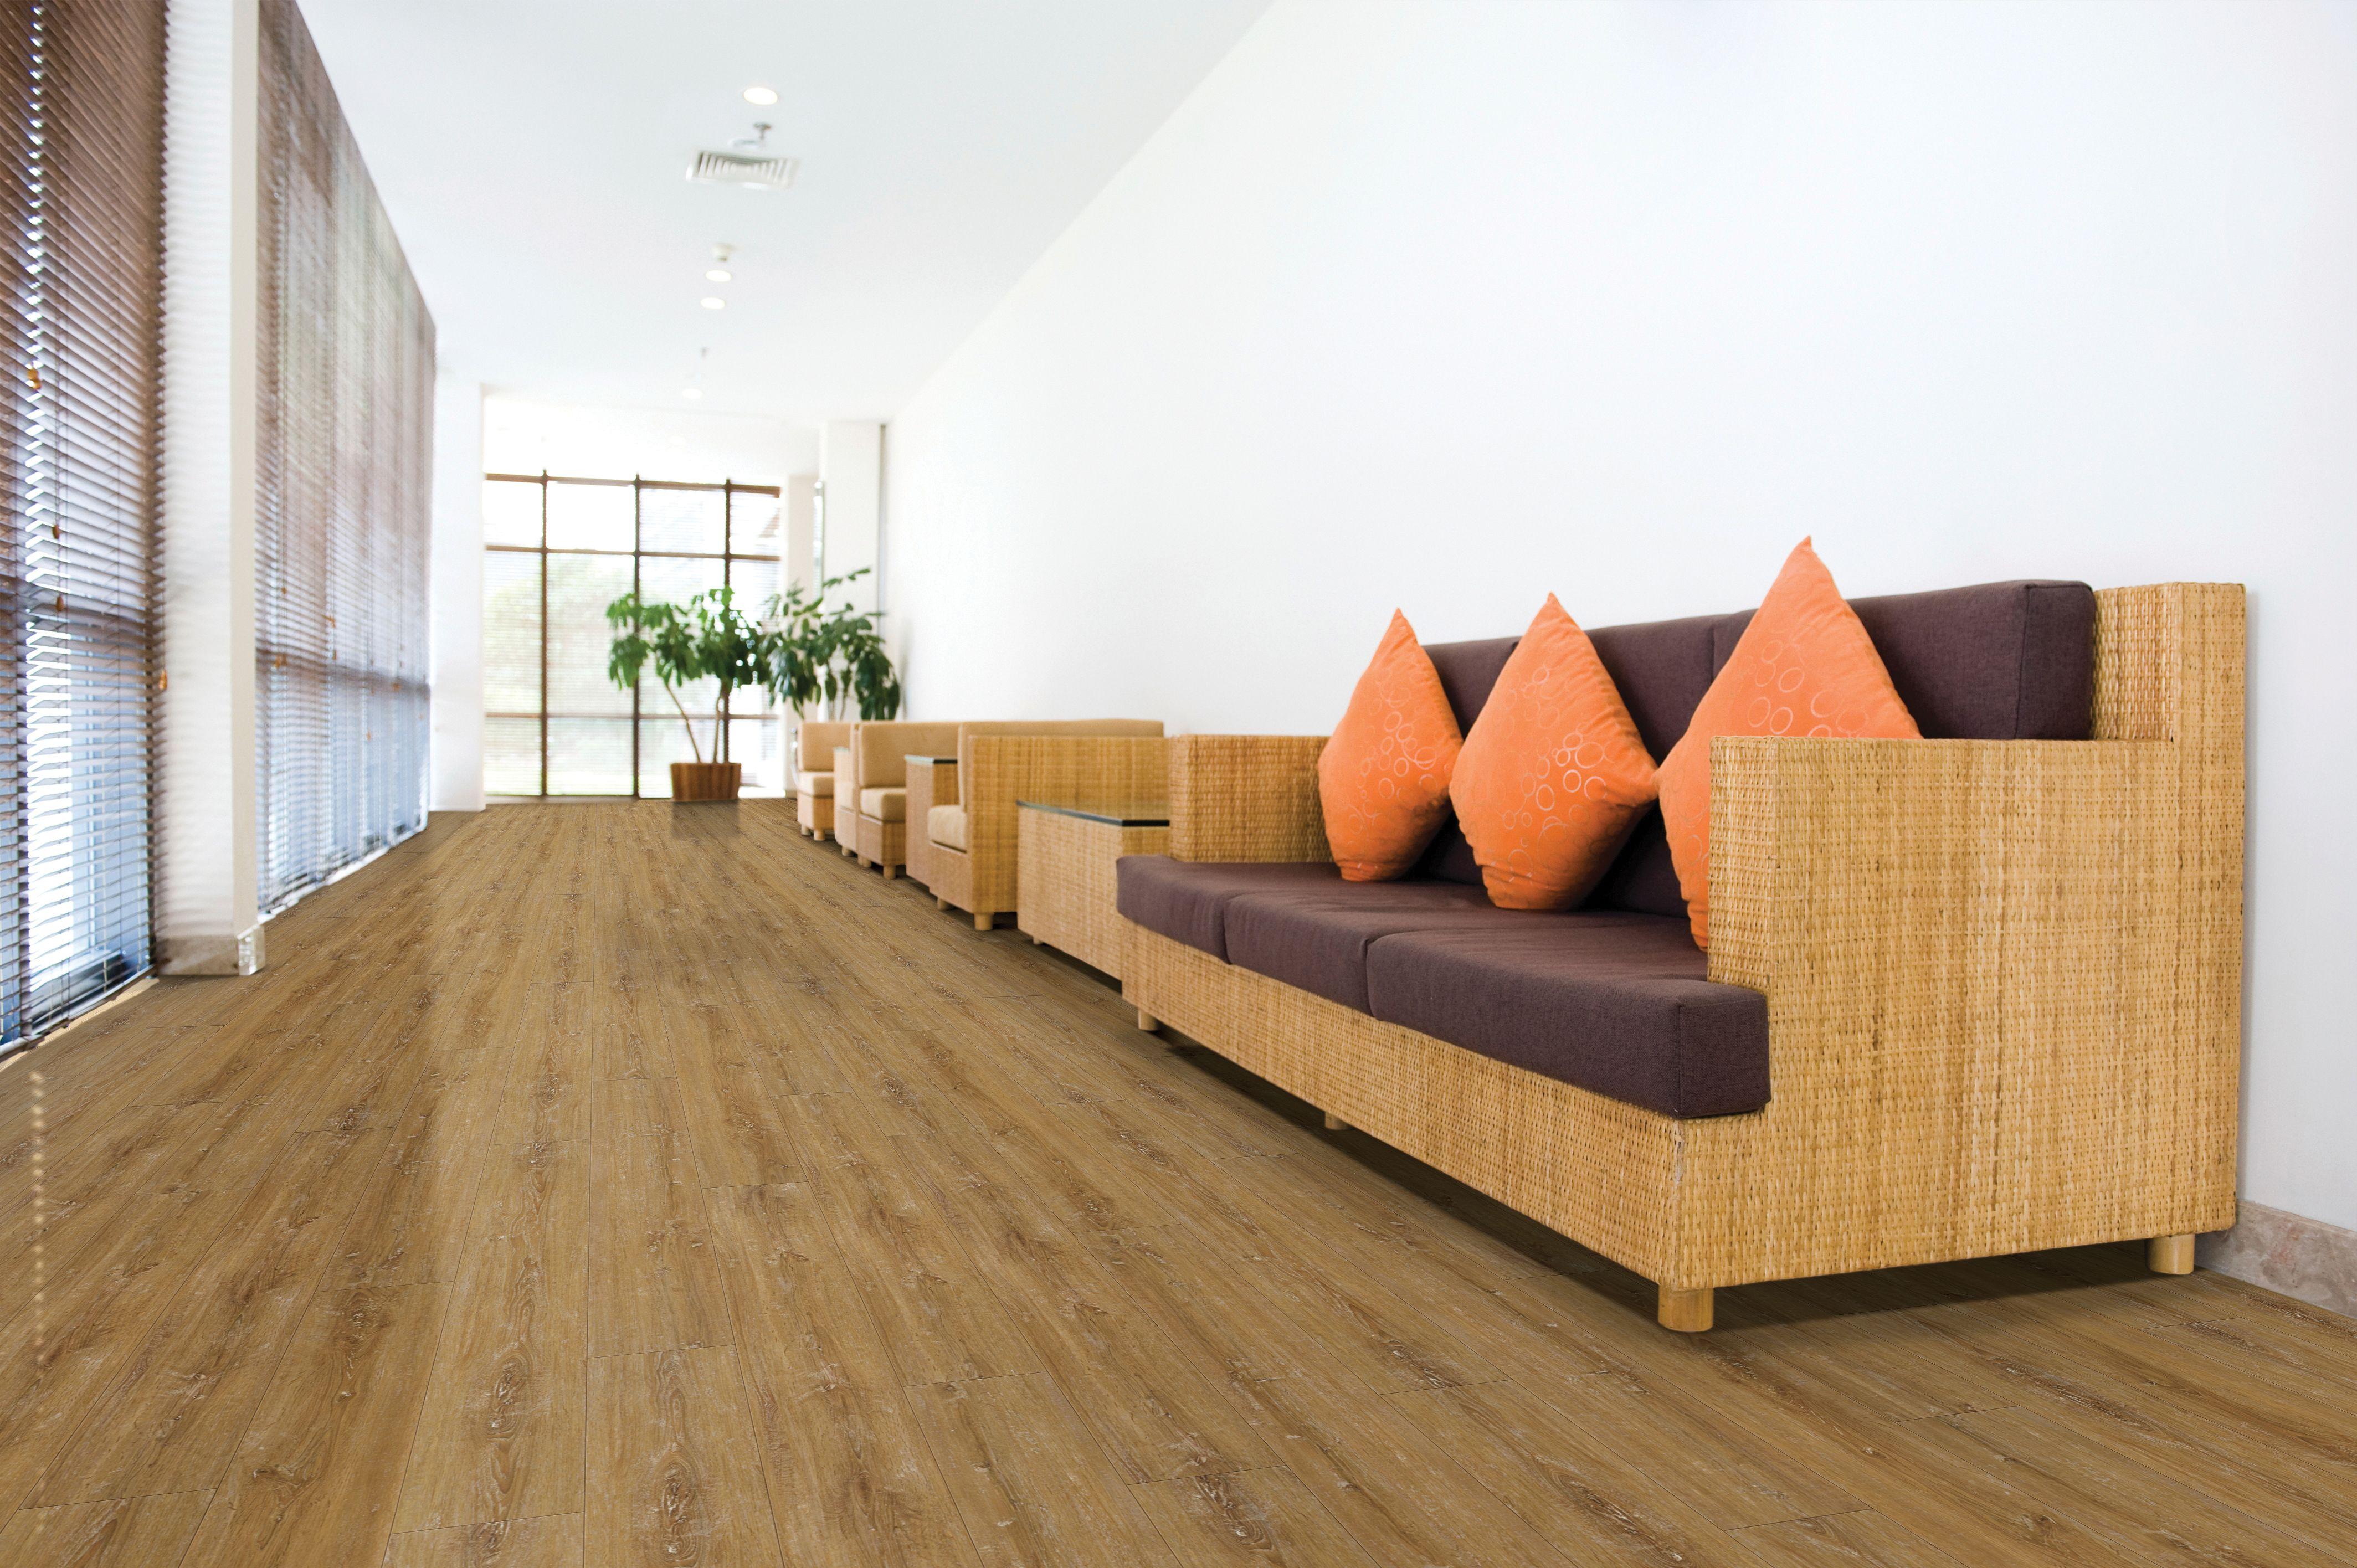 Interieur Woonkamer Eiken : Vloer inspiratie pvc vloer eiken vloer woonkamer